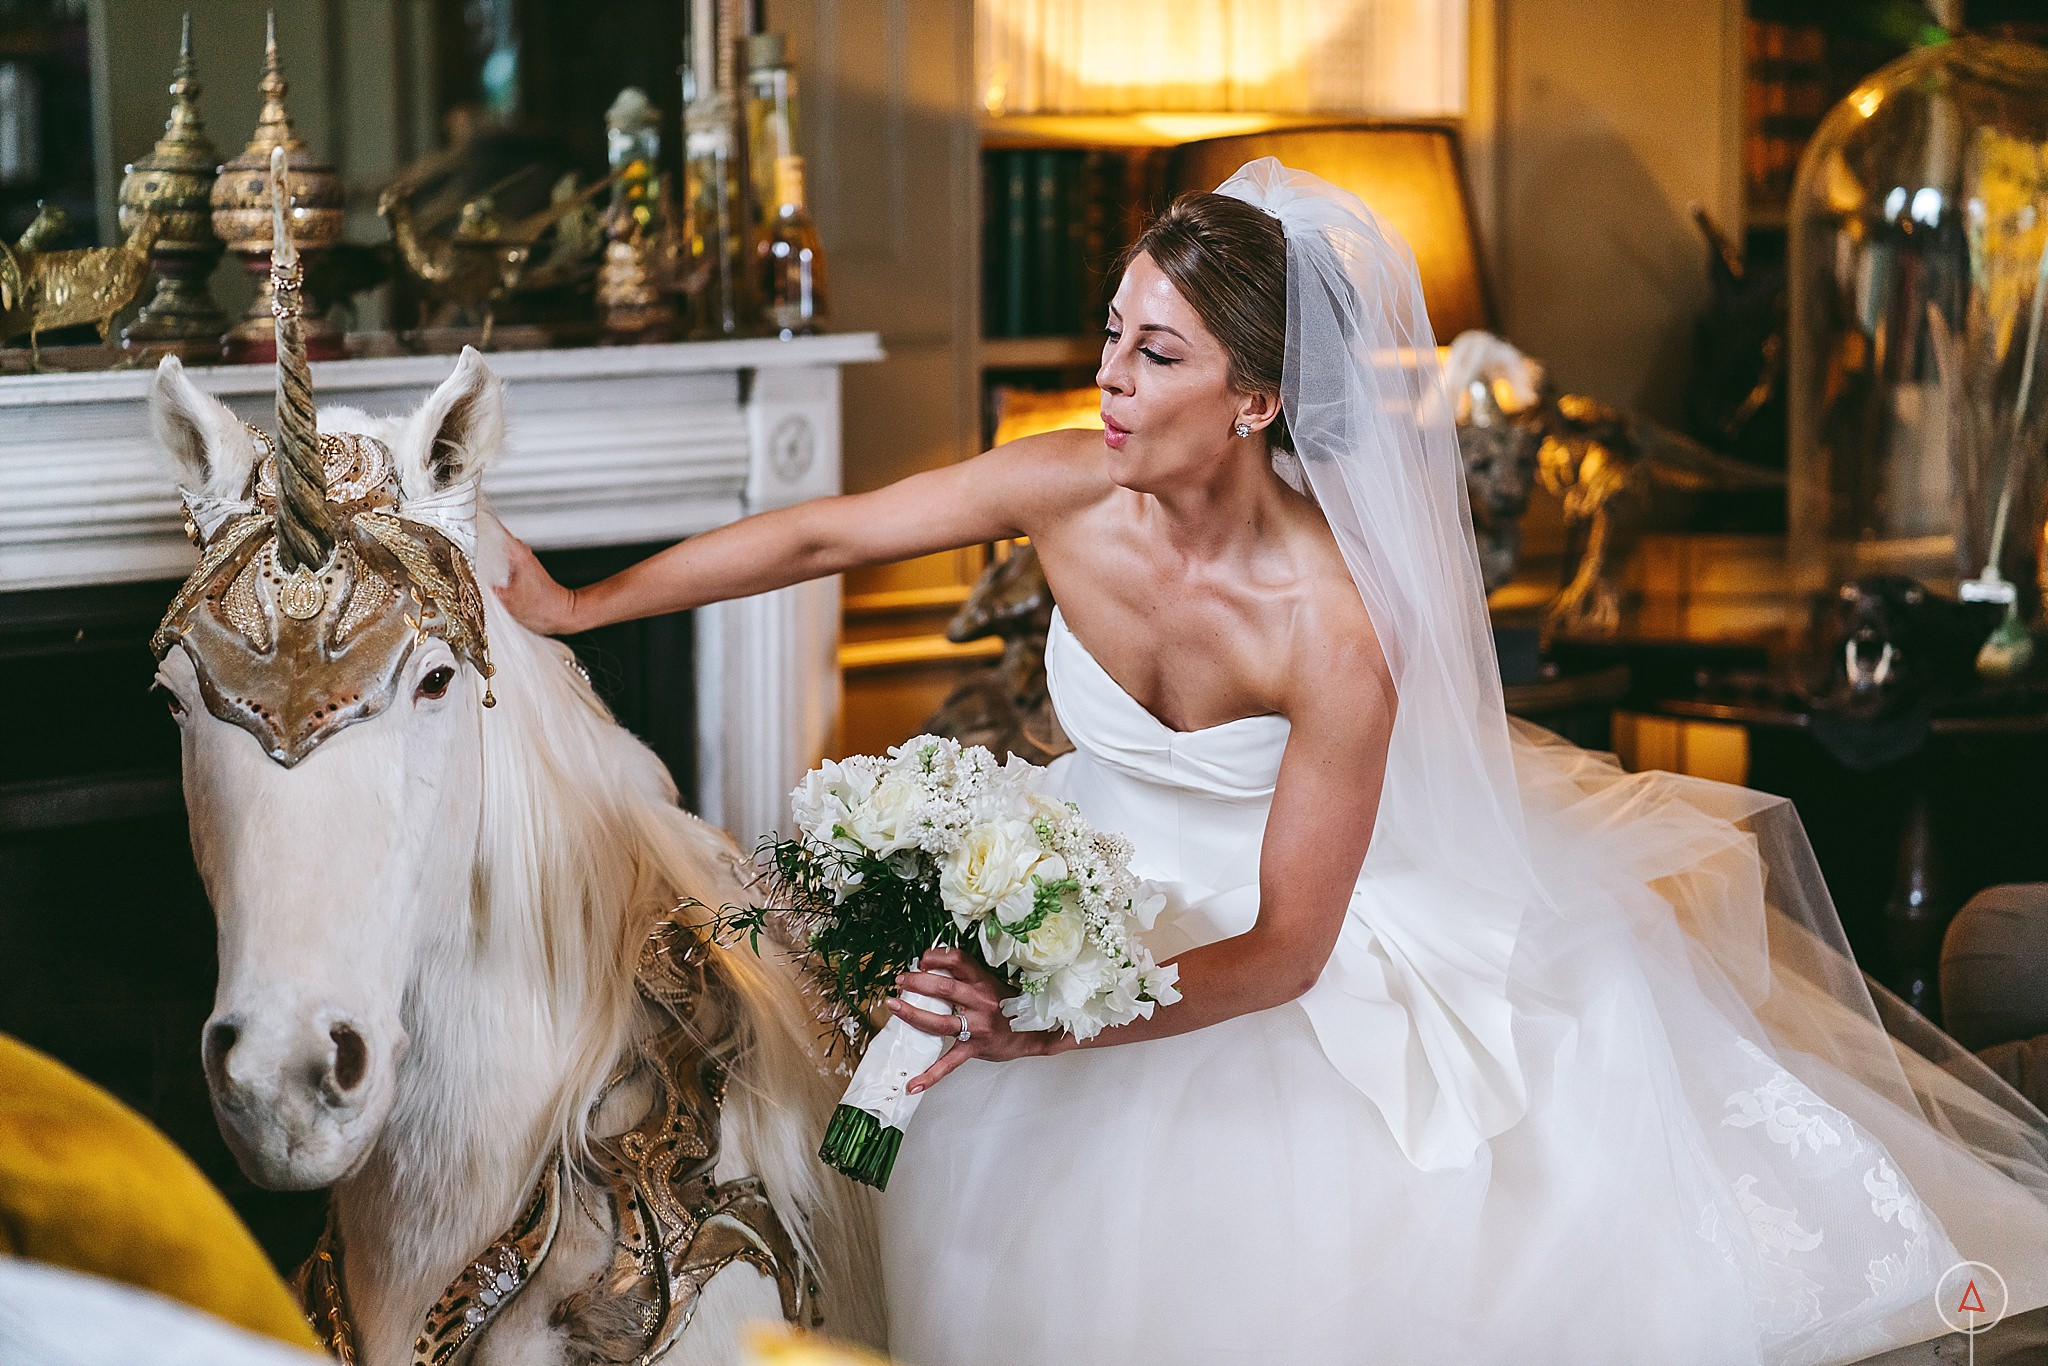 cardiff-wedding-photographer-aga-tomaszek_0266